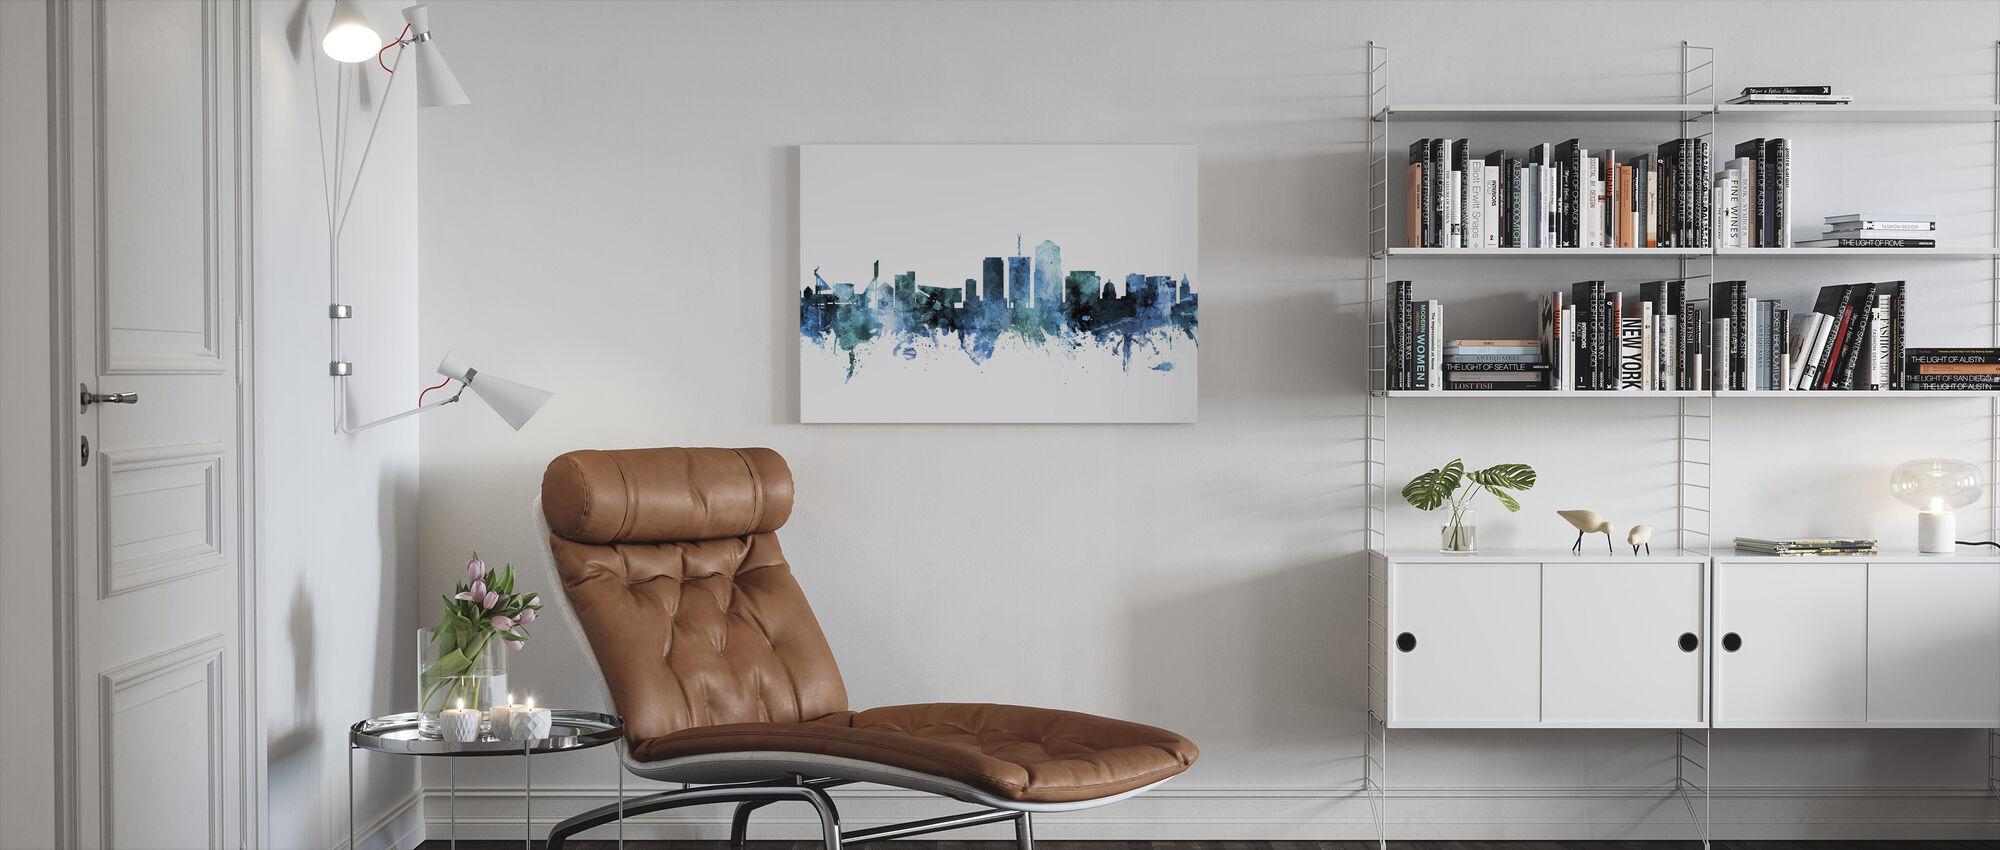 Skyline van Tucson Arizona - Canvas print - Woonkamer